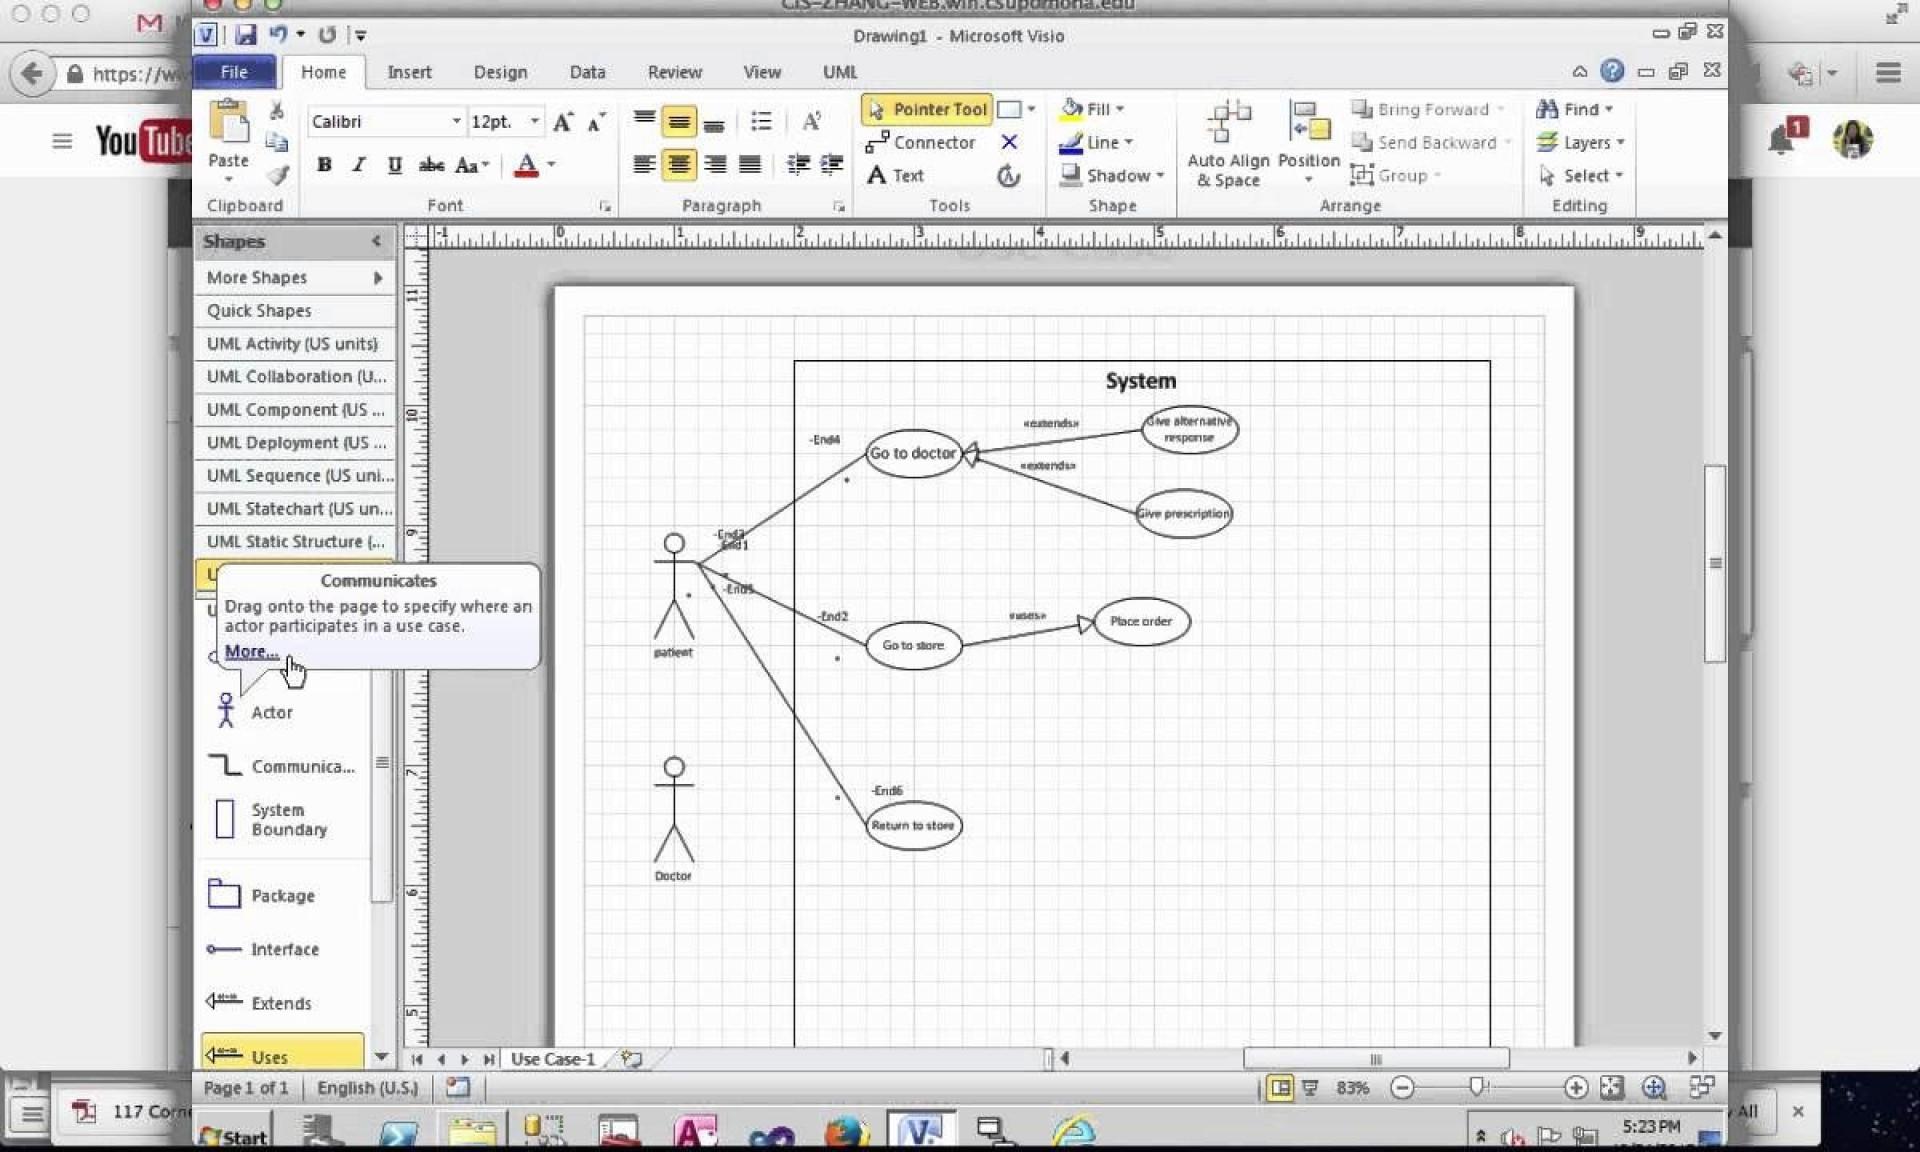 001 Staggering Use Case Diagram Template Visio 2010 Photo  Uml Model Download Clas1920